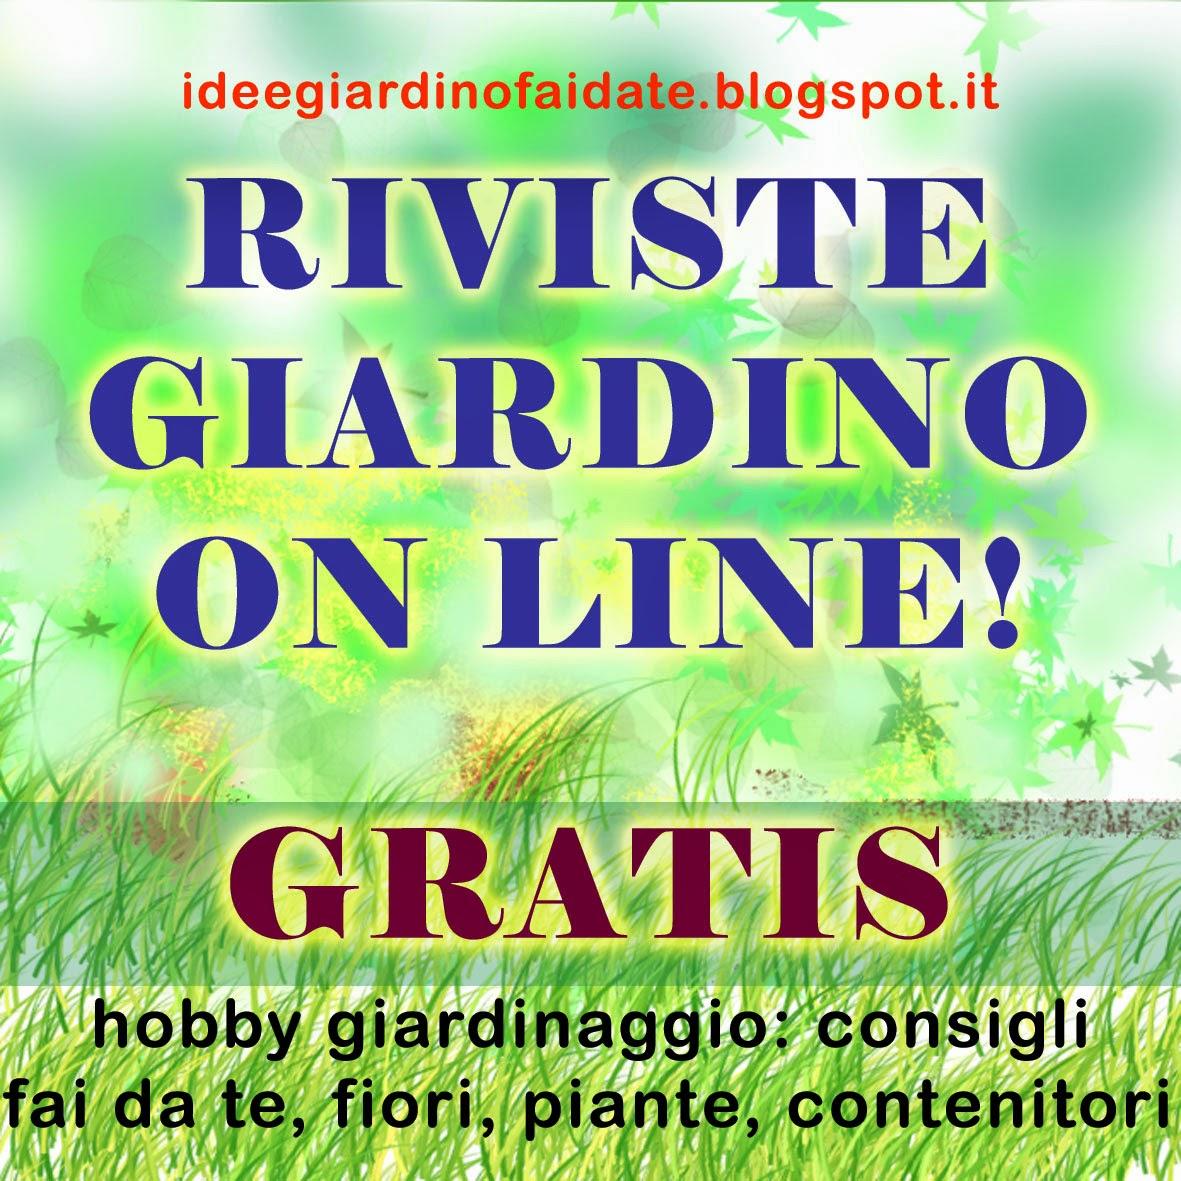 riviste gratis giardino on line tutti i siti giornali